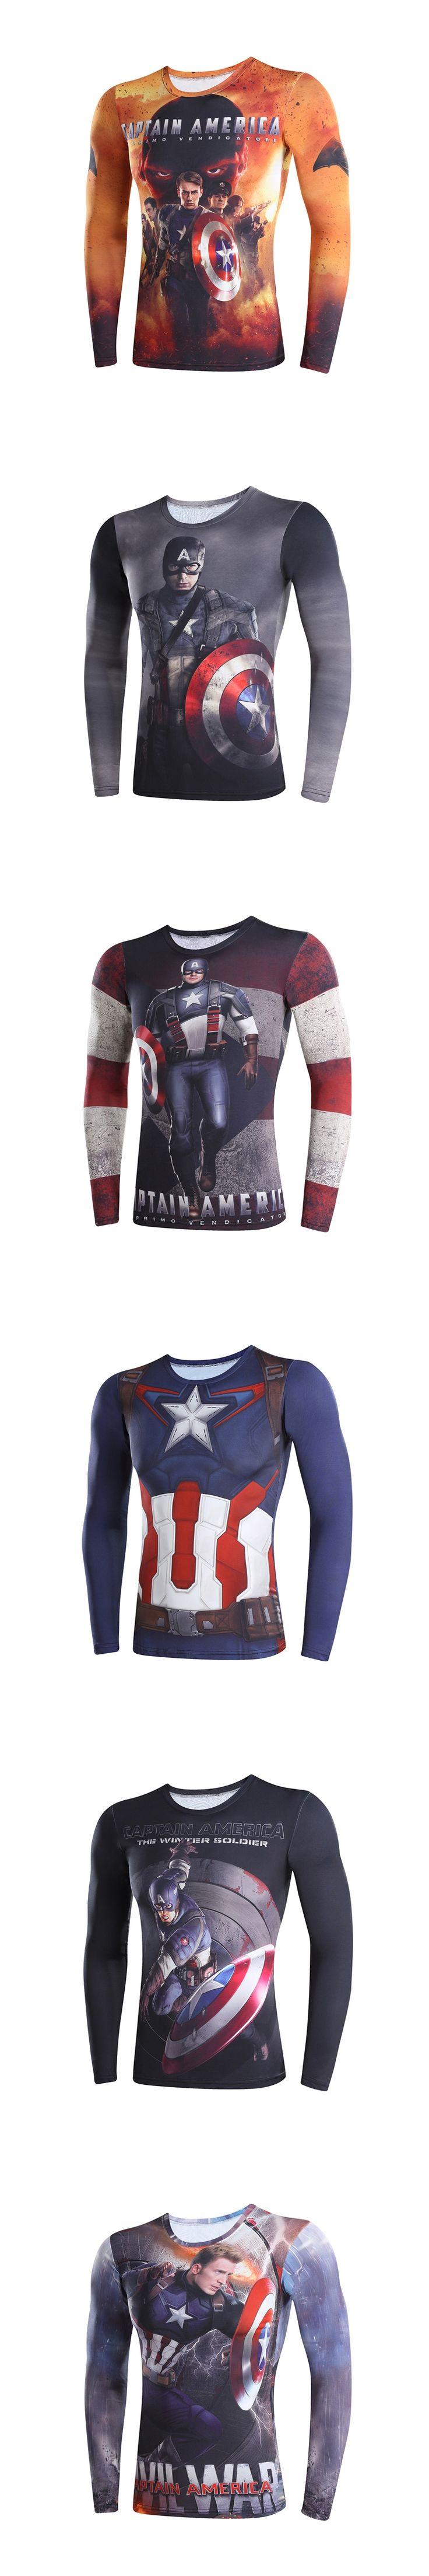 3D t-shirts digital printing compressed t-shirts men long sleeve Superman Deadpool iron Man captain America 3 model